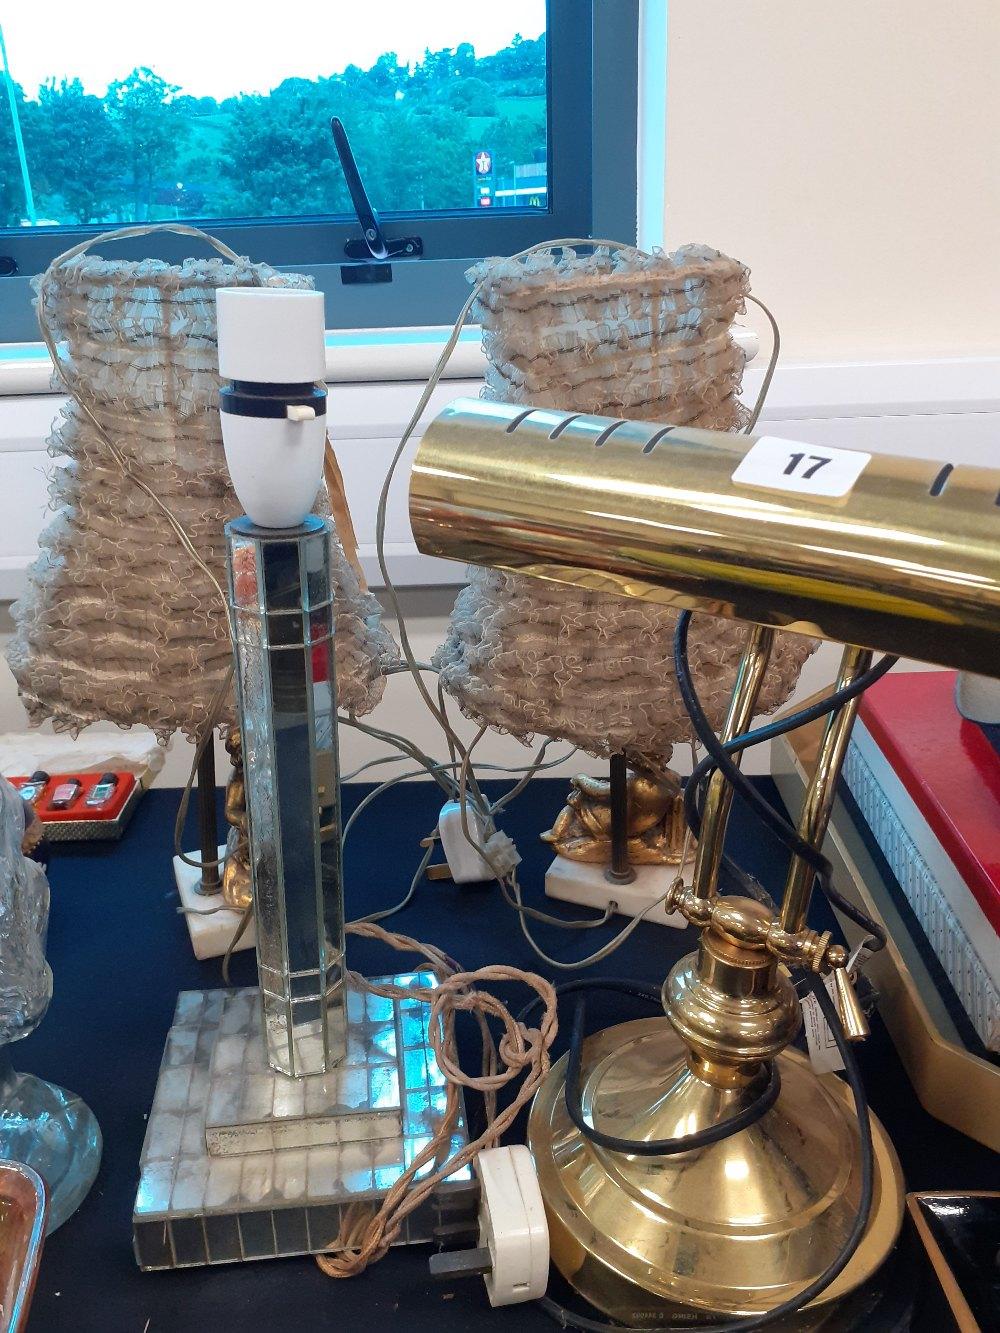 PAIR OF CHERUB TABLE LAMP